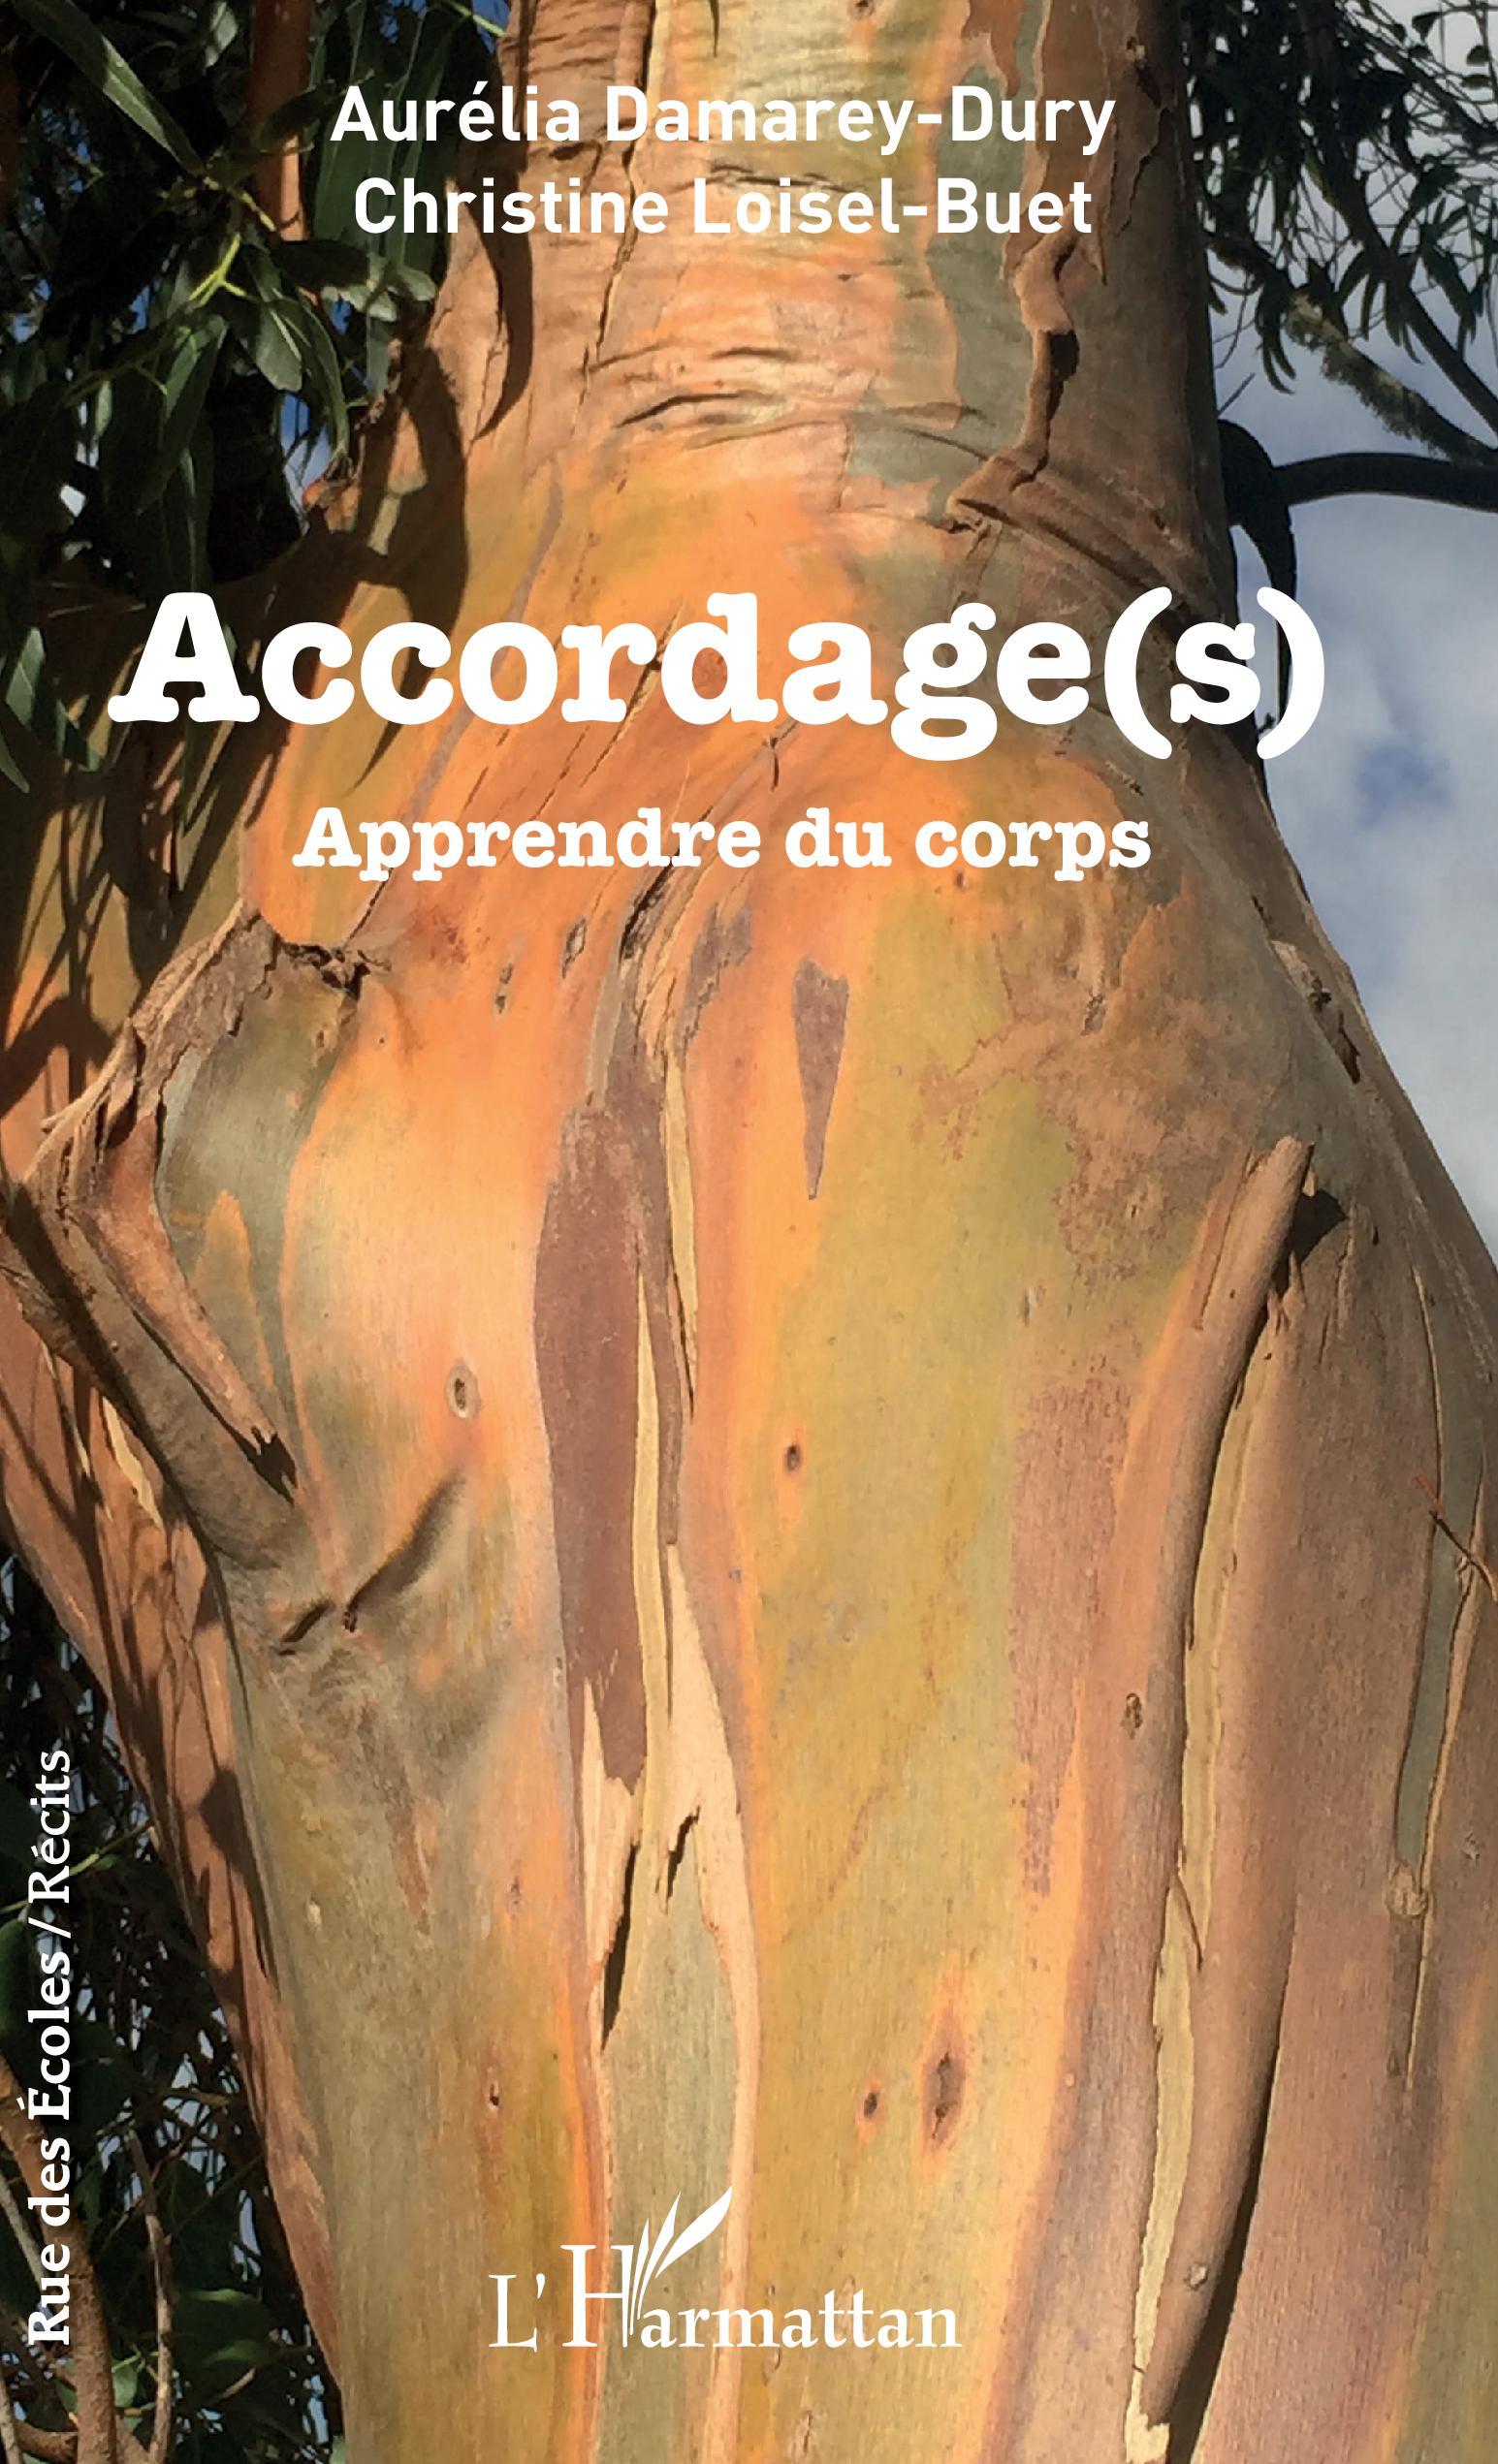 ACCORDAGE(S) - Apprendre du corps, Aurélia Damarey-Dury, Christine ...